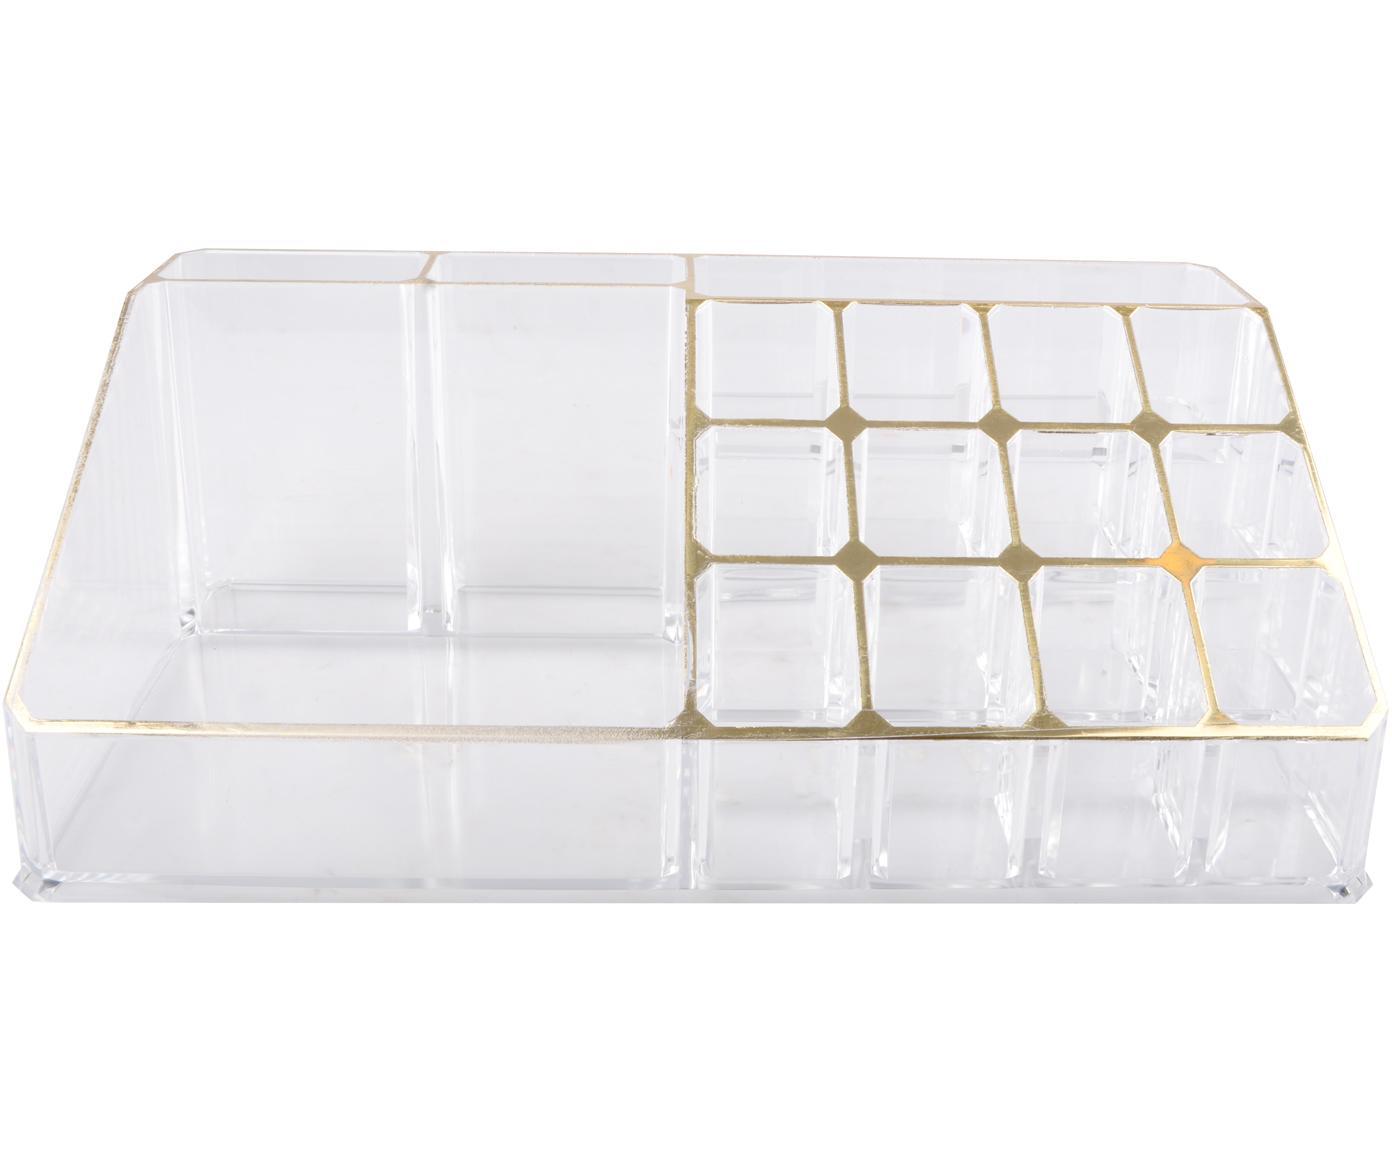 Organizador de cosméticos Malla, Plástico, Transparente, dorado, An 22 x Al 8 cm